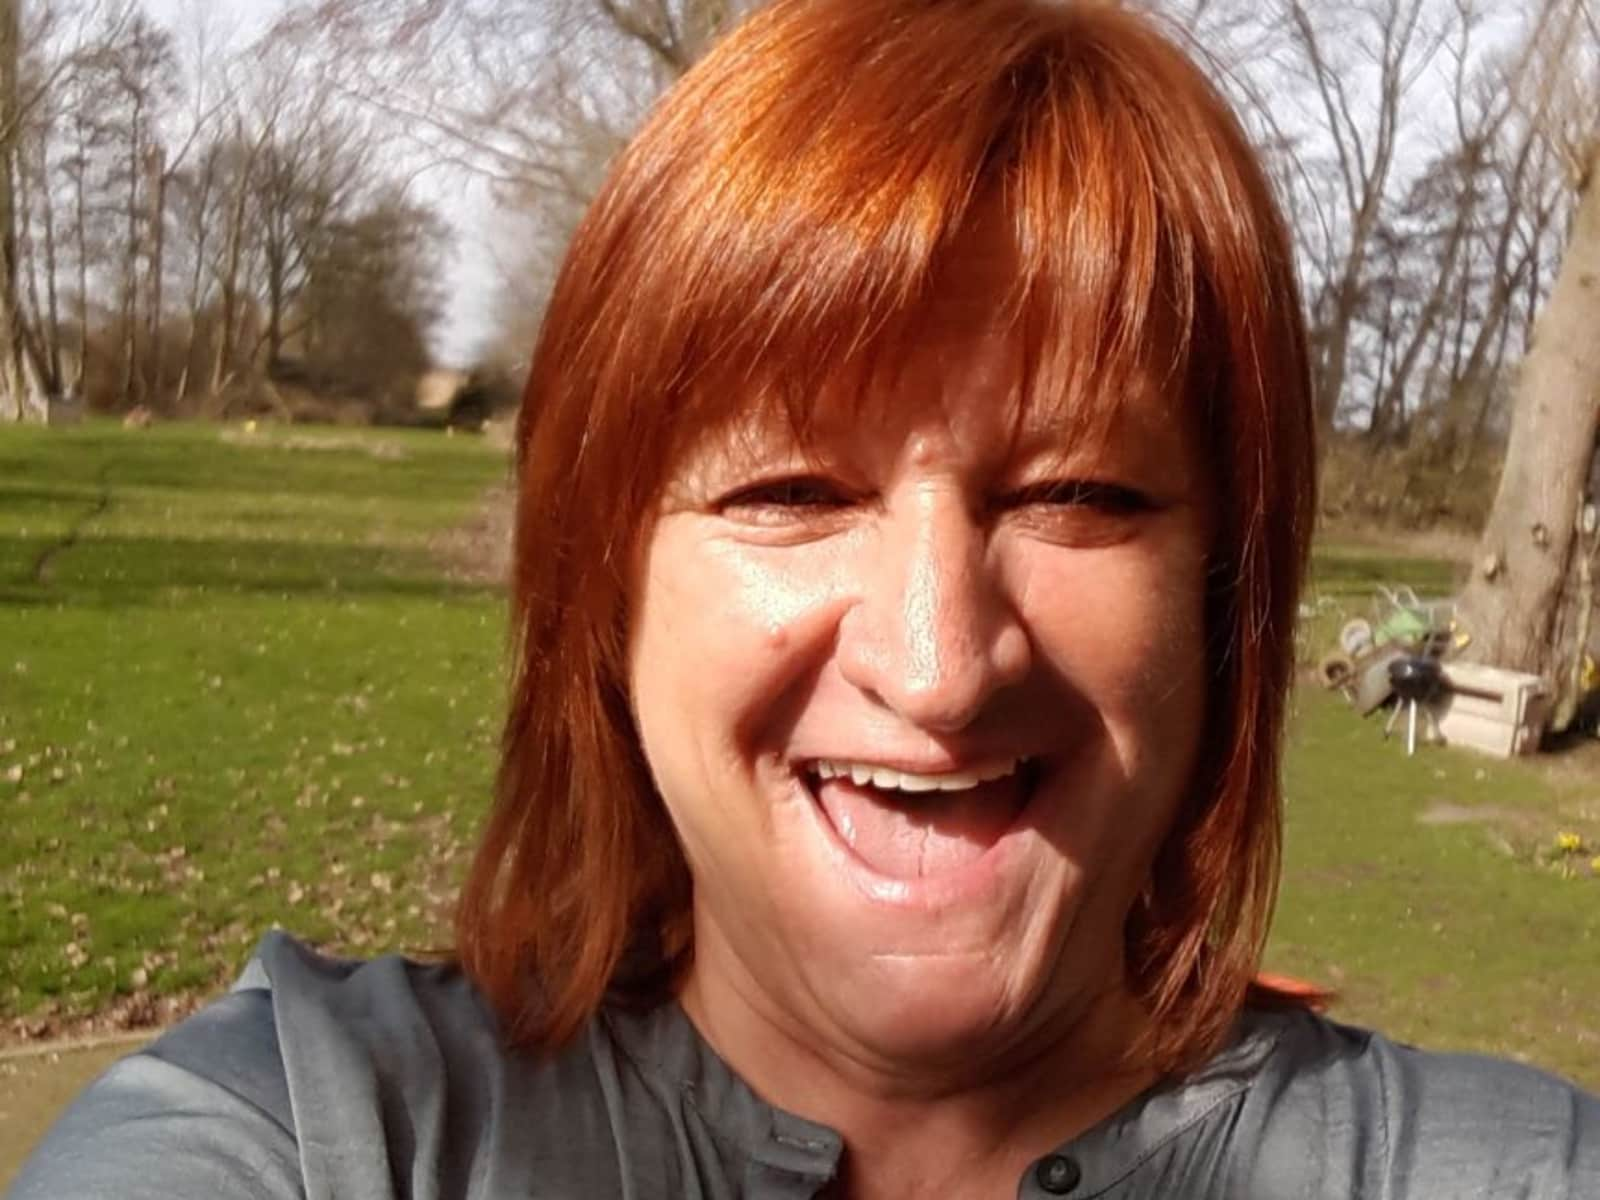 Anita from Middelie, Netherlands